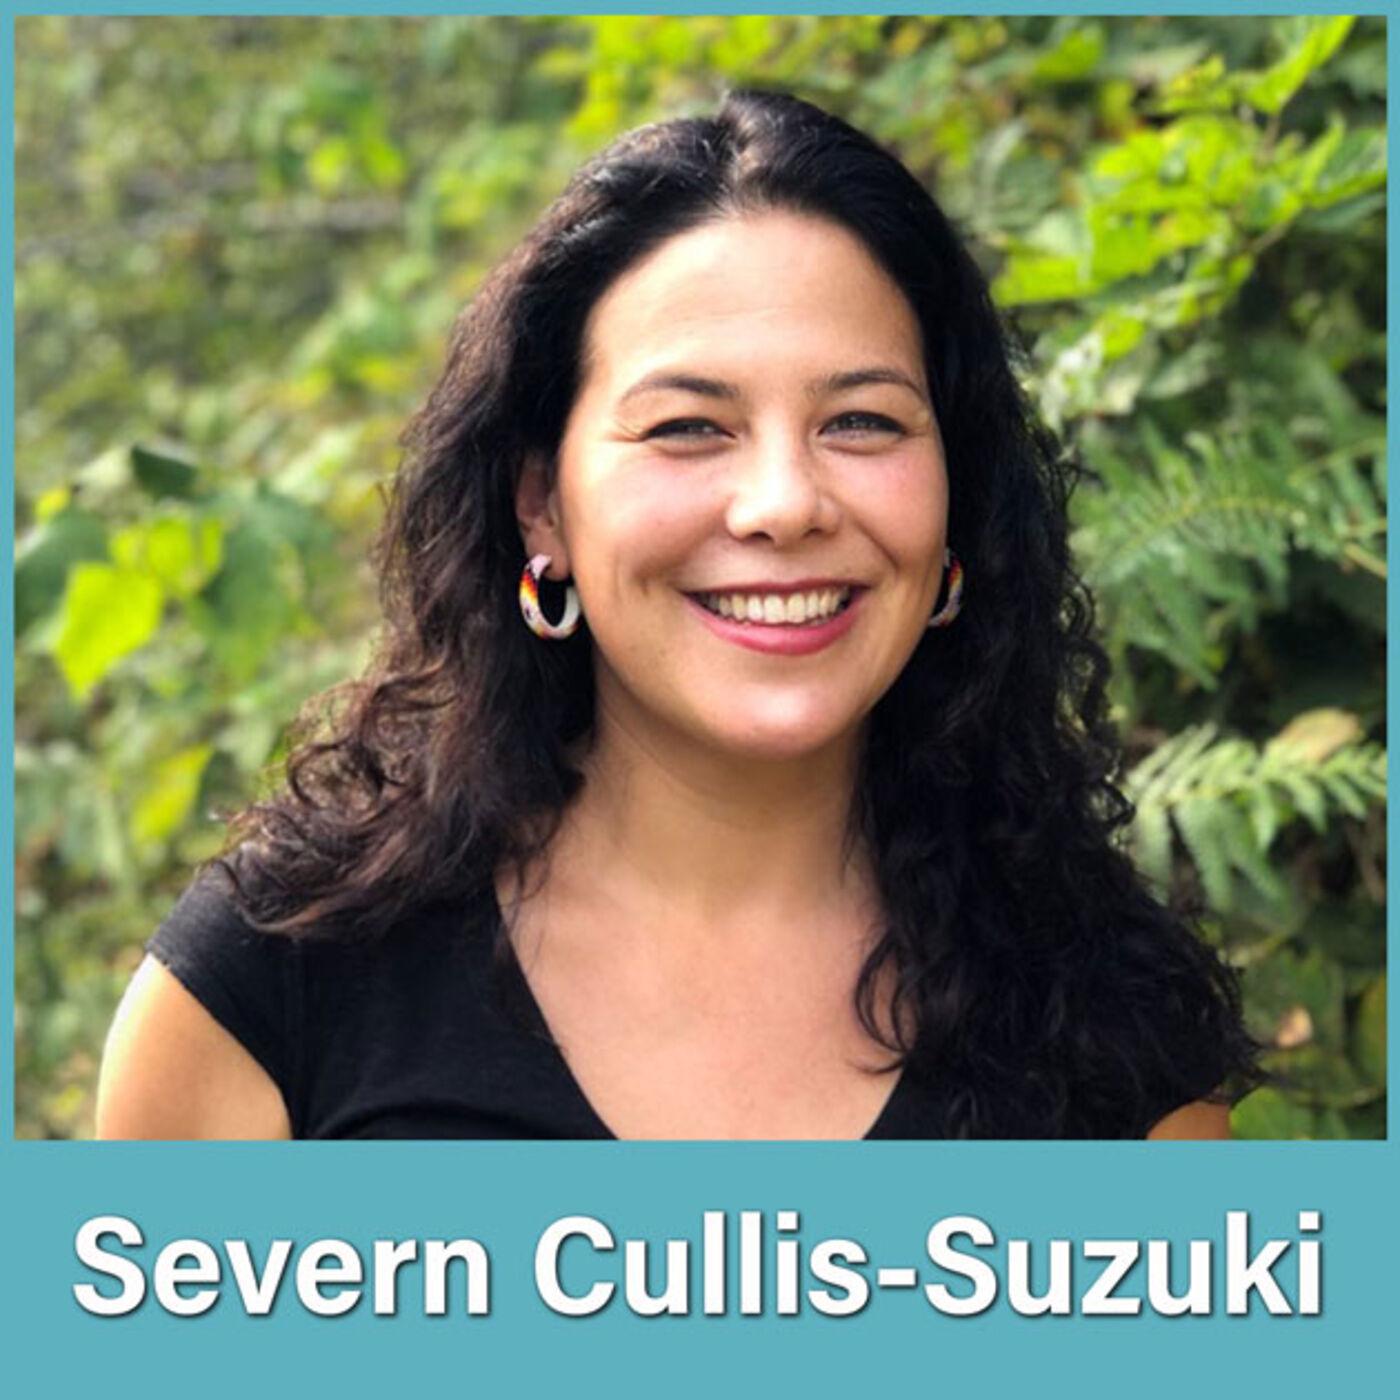 #6 Severn Cullis-Suzuki